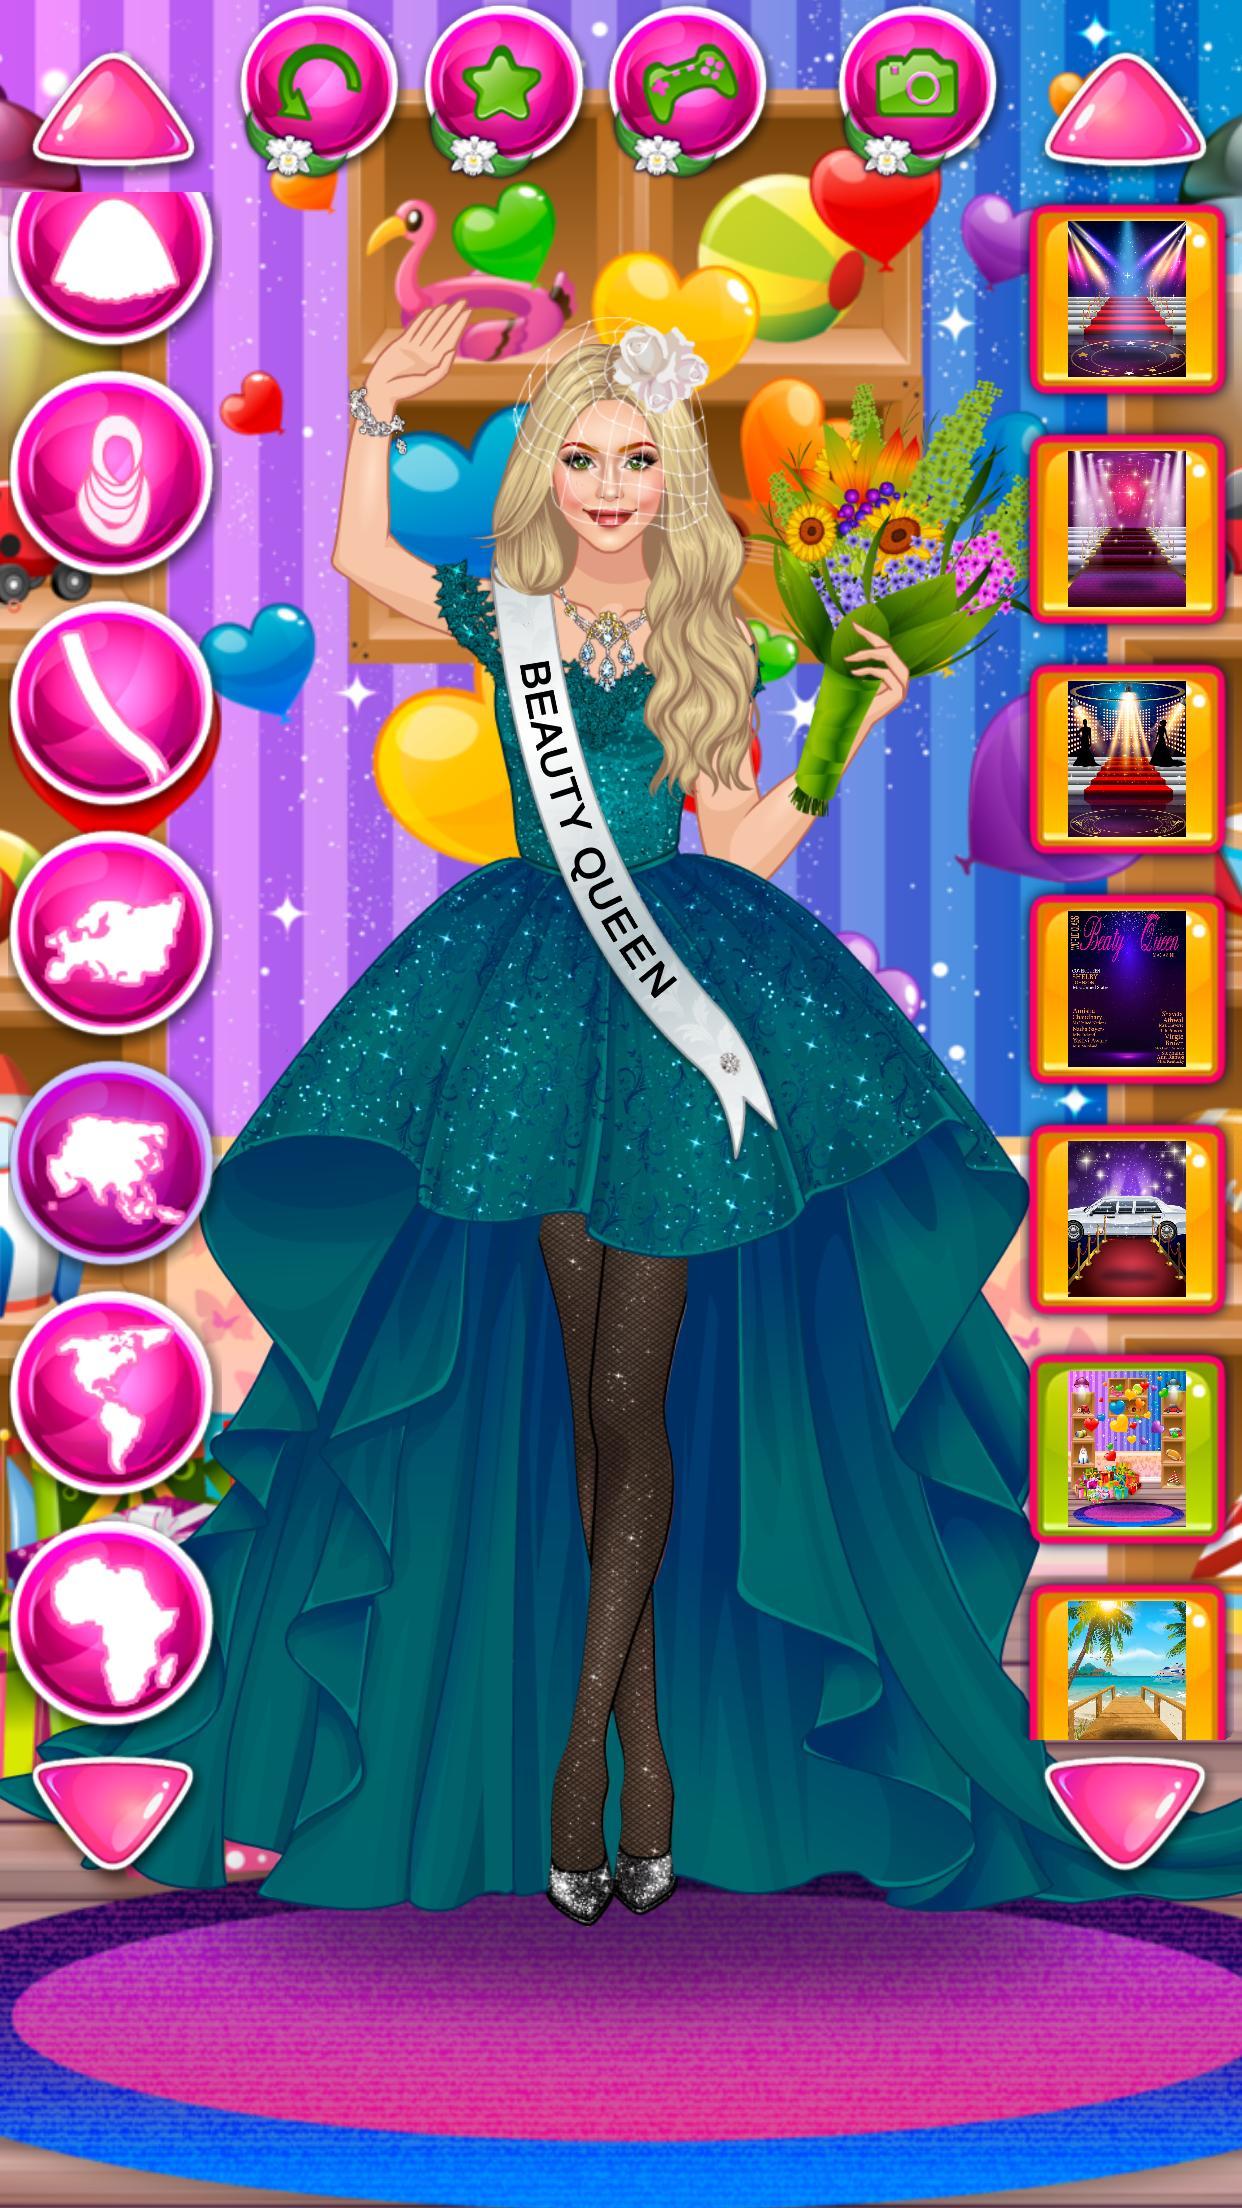 Beauty Queen Dress Up - Star Girl Fashion 1.1 Screenshot 15